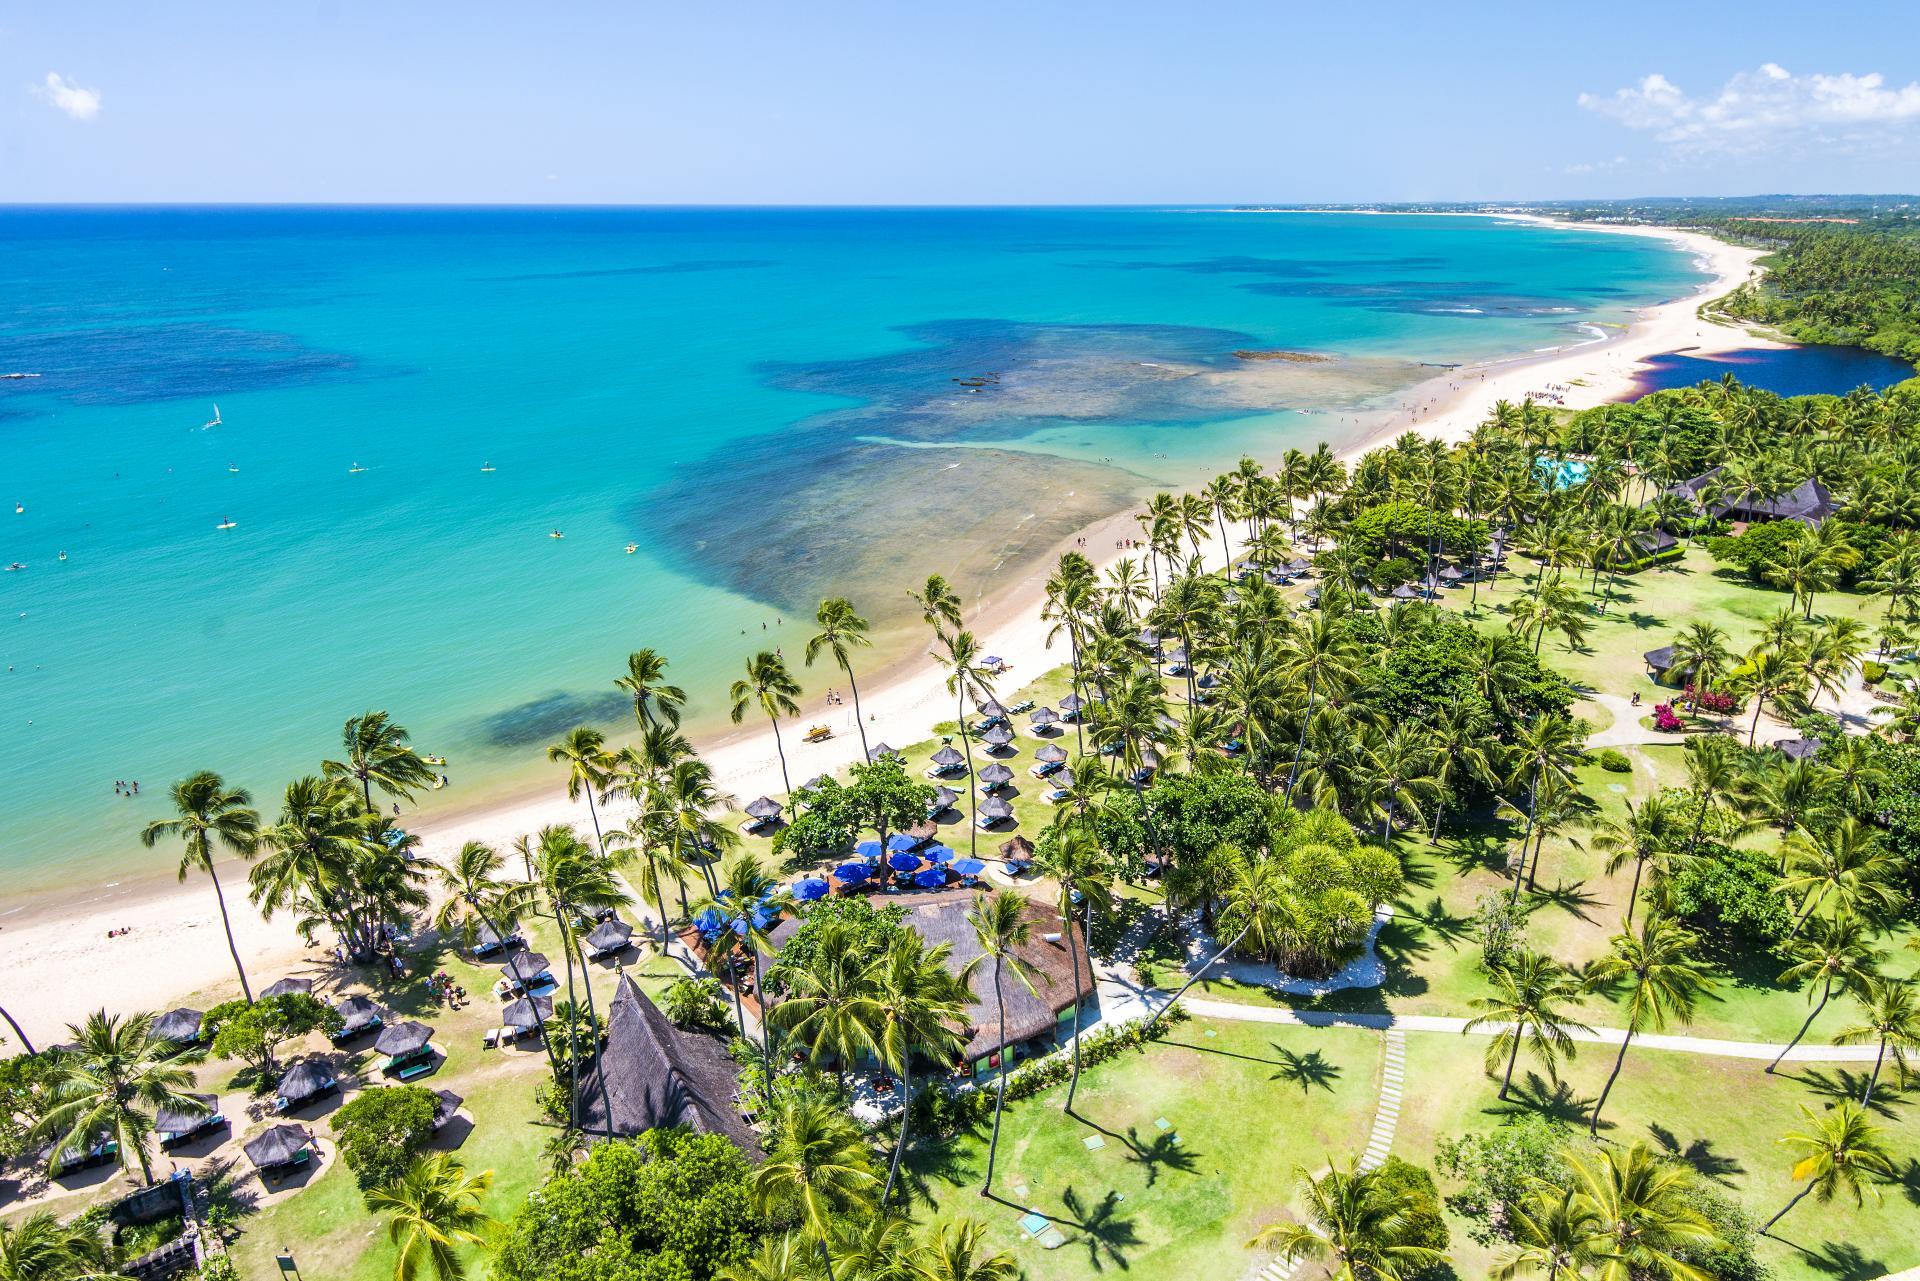 Brazil Praia do Forte: Deluxe Hotel - Hotel Tivoli Ecoresort